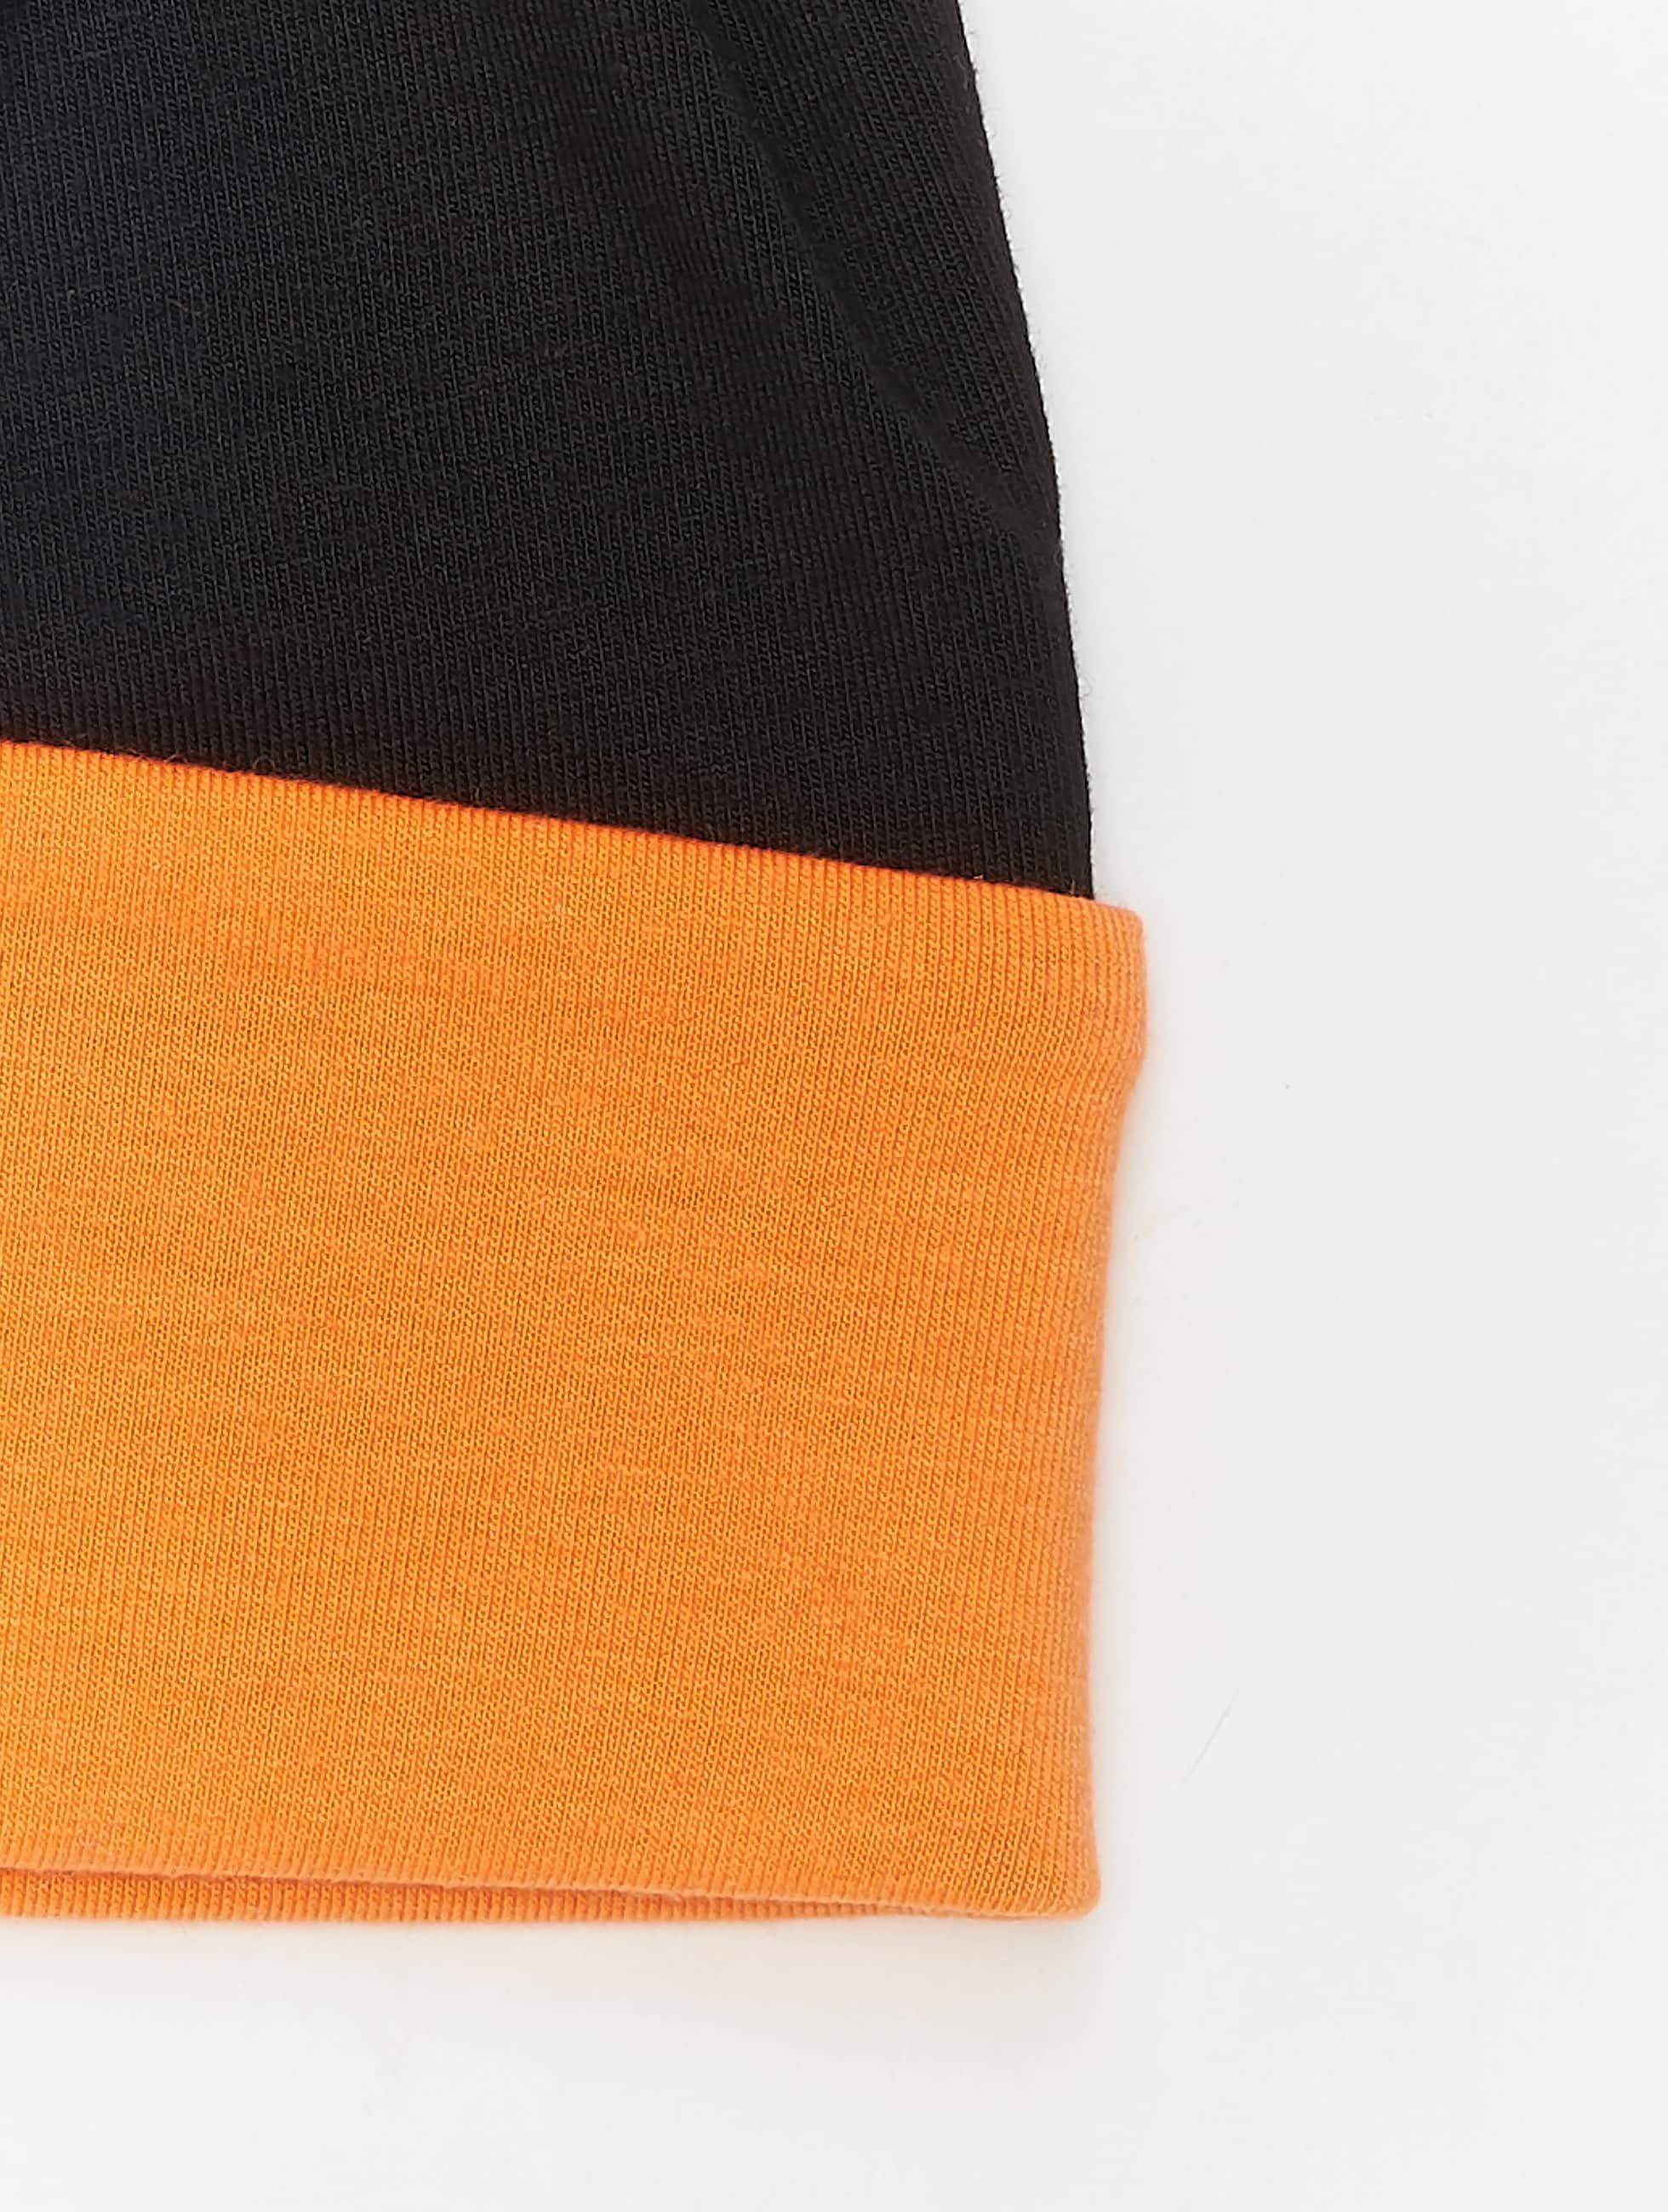 MSTRDS шляпа Jersey Reversible оранжевый